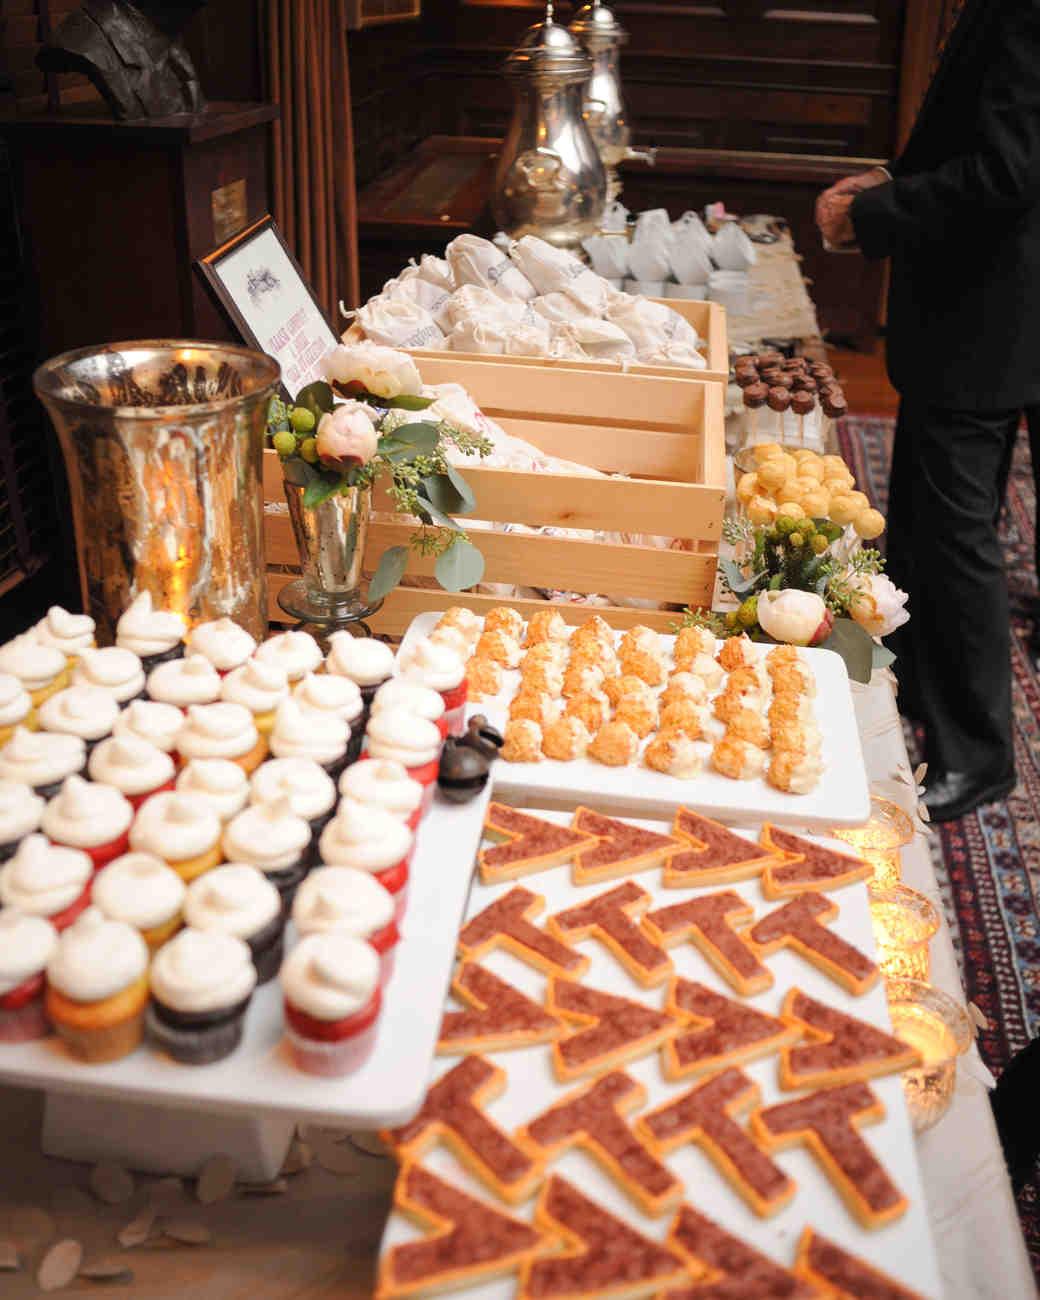 dessert table ideas from real weddings martha stewart weddings rh marthastewartweddings com rustic wedding dessert bar ideas wedding shower dessert bar ideas